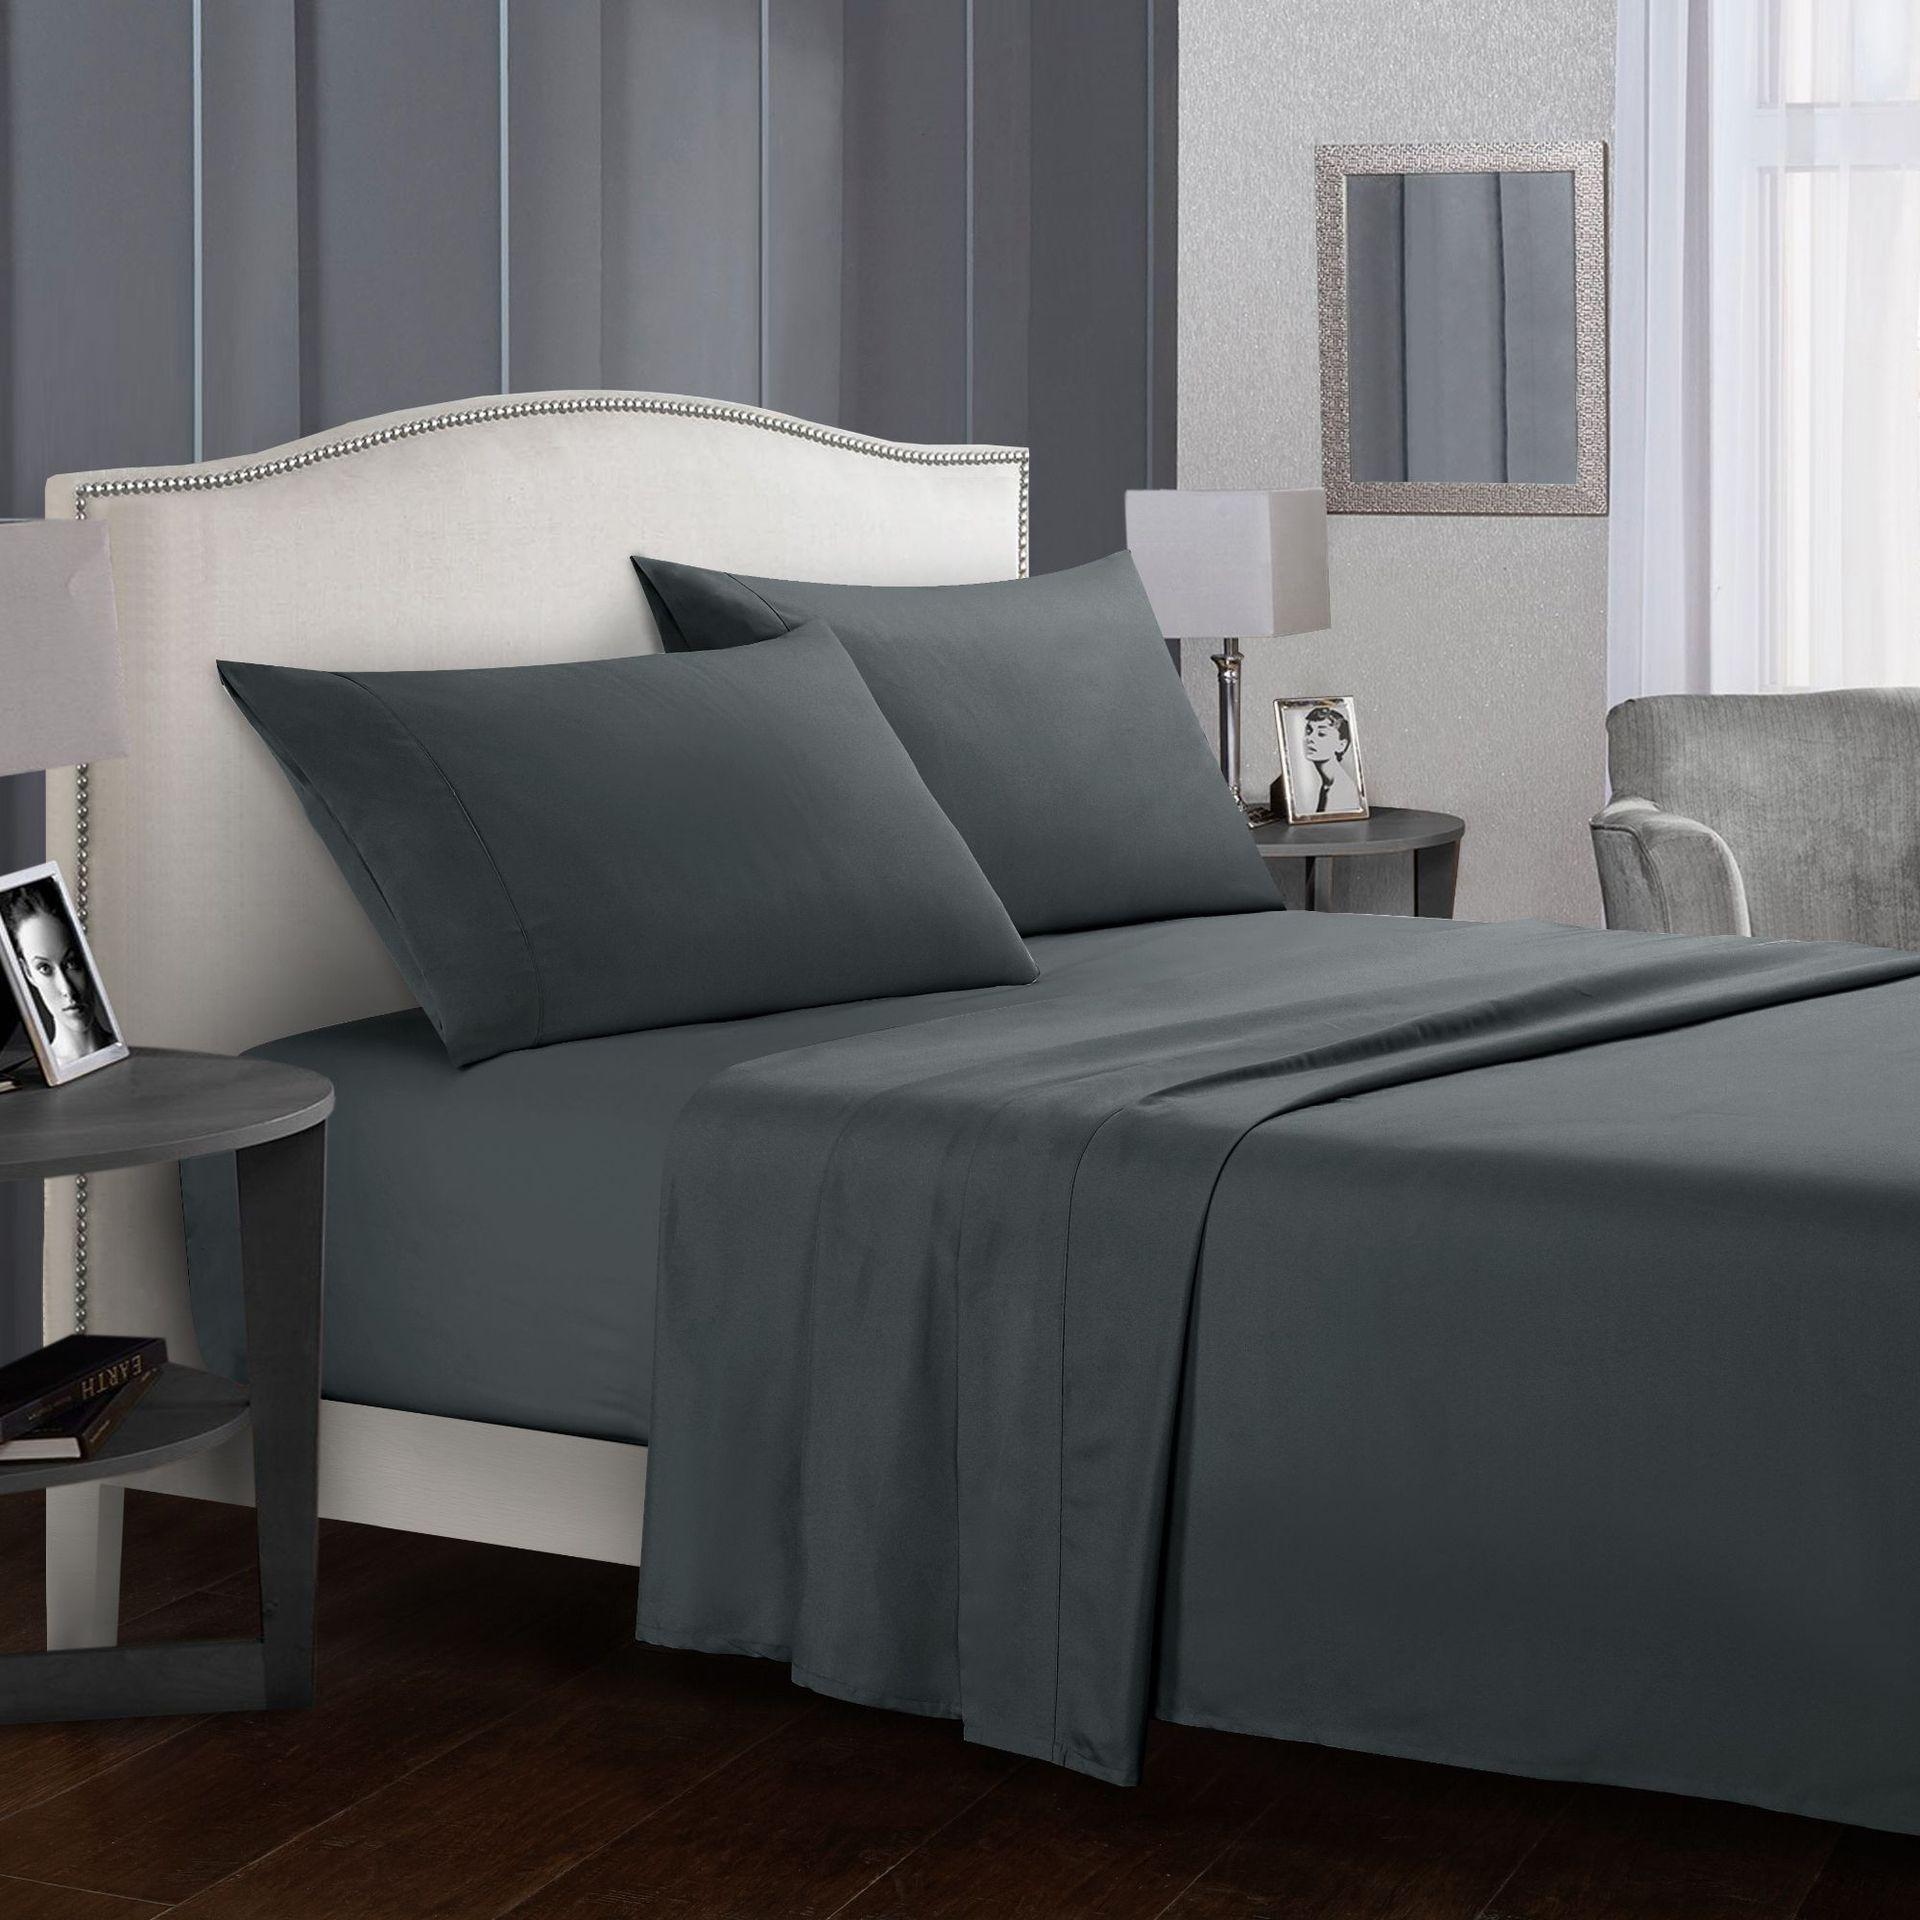 Cama Definir Breve Conjunto de Cama Roupa De Cama Folha Plana + Lençol + Fronha Queen/King Size Cinza Macio e confortável branco cama set70